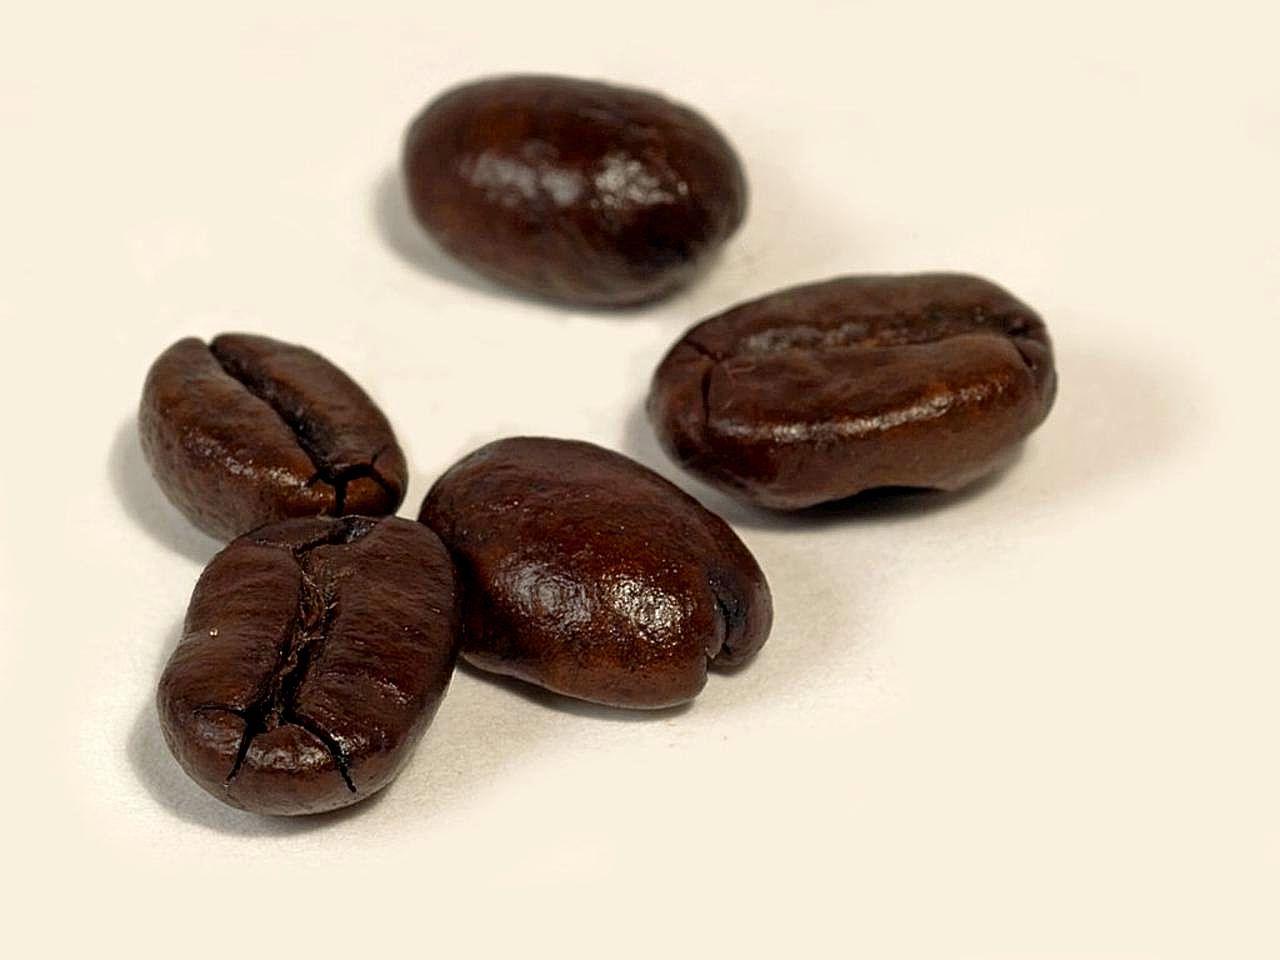 File:Dark roasted coffee on white background.jpg - Wikimedia Commons: commons.wikimedia.org/wiki/file:dark_roasted_coffee_on_white...